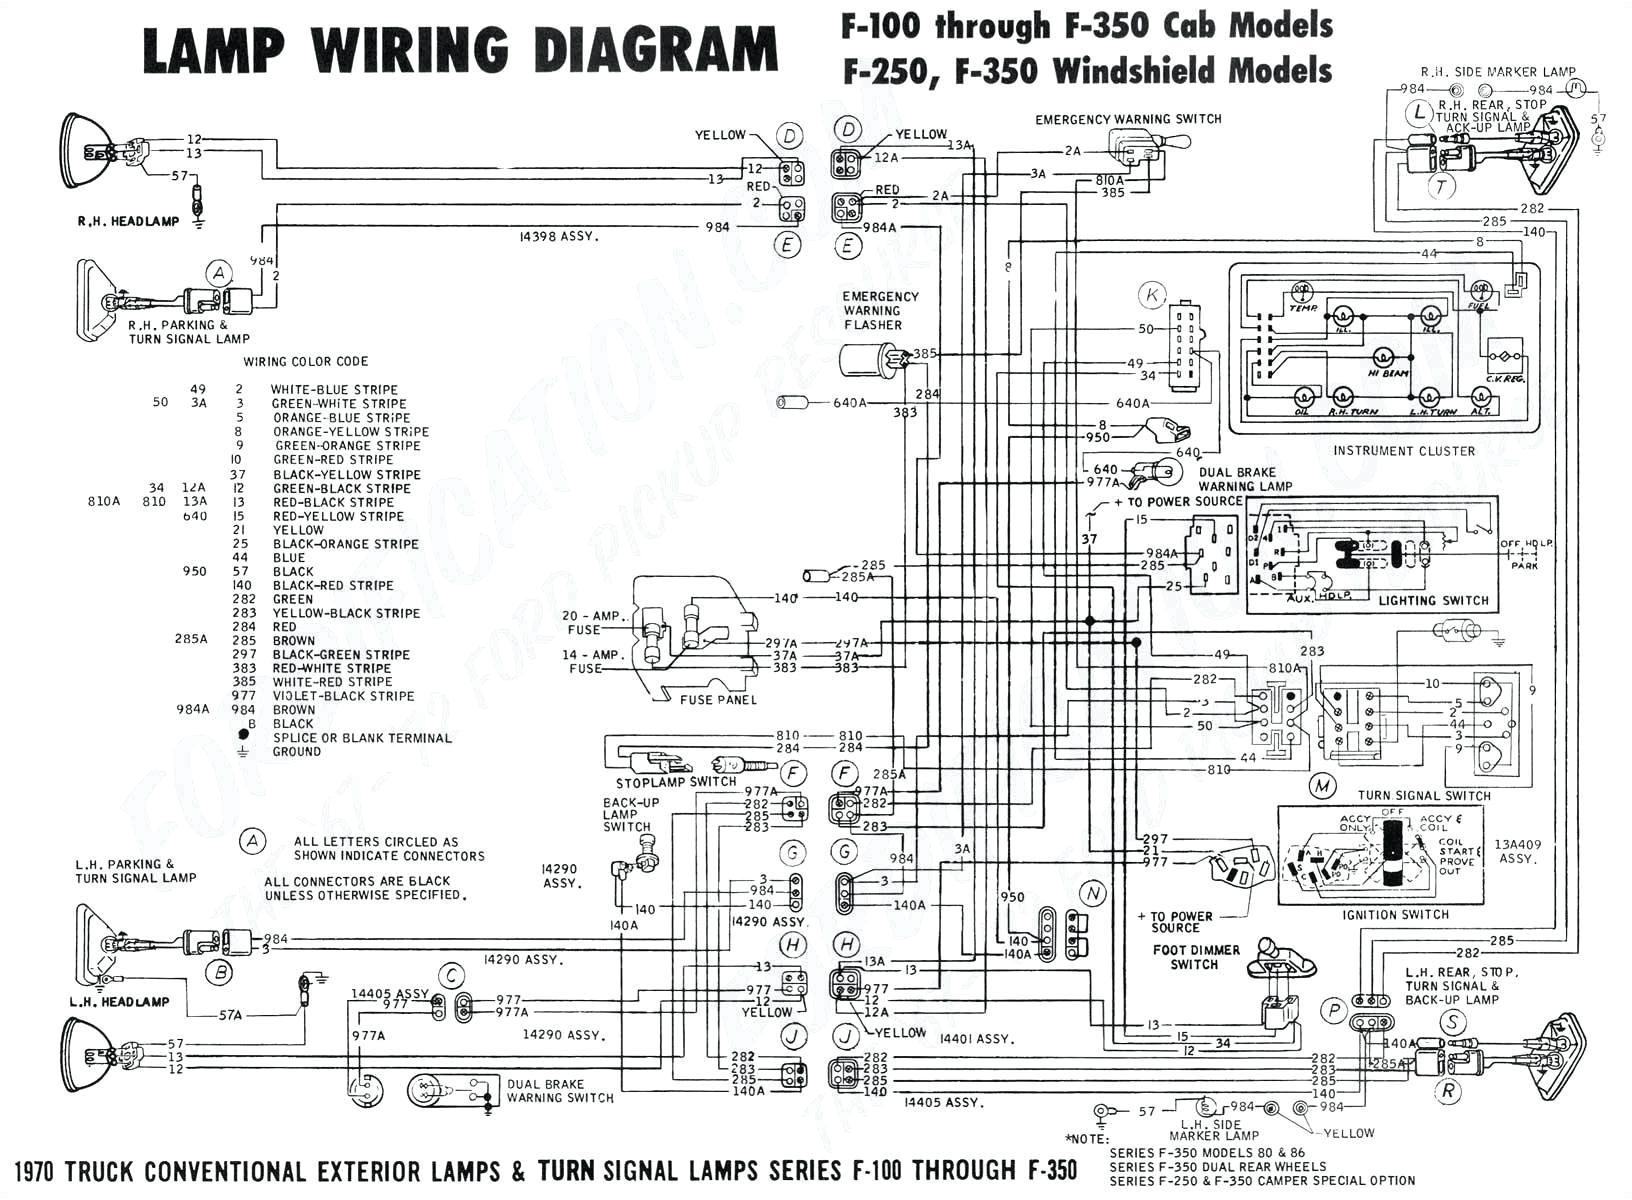 rsx garage door sensor wiring diagram wiring diagram centre wiring diagram for a garage door opener